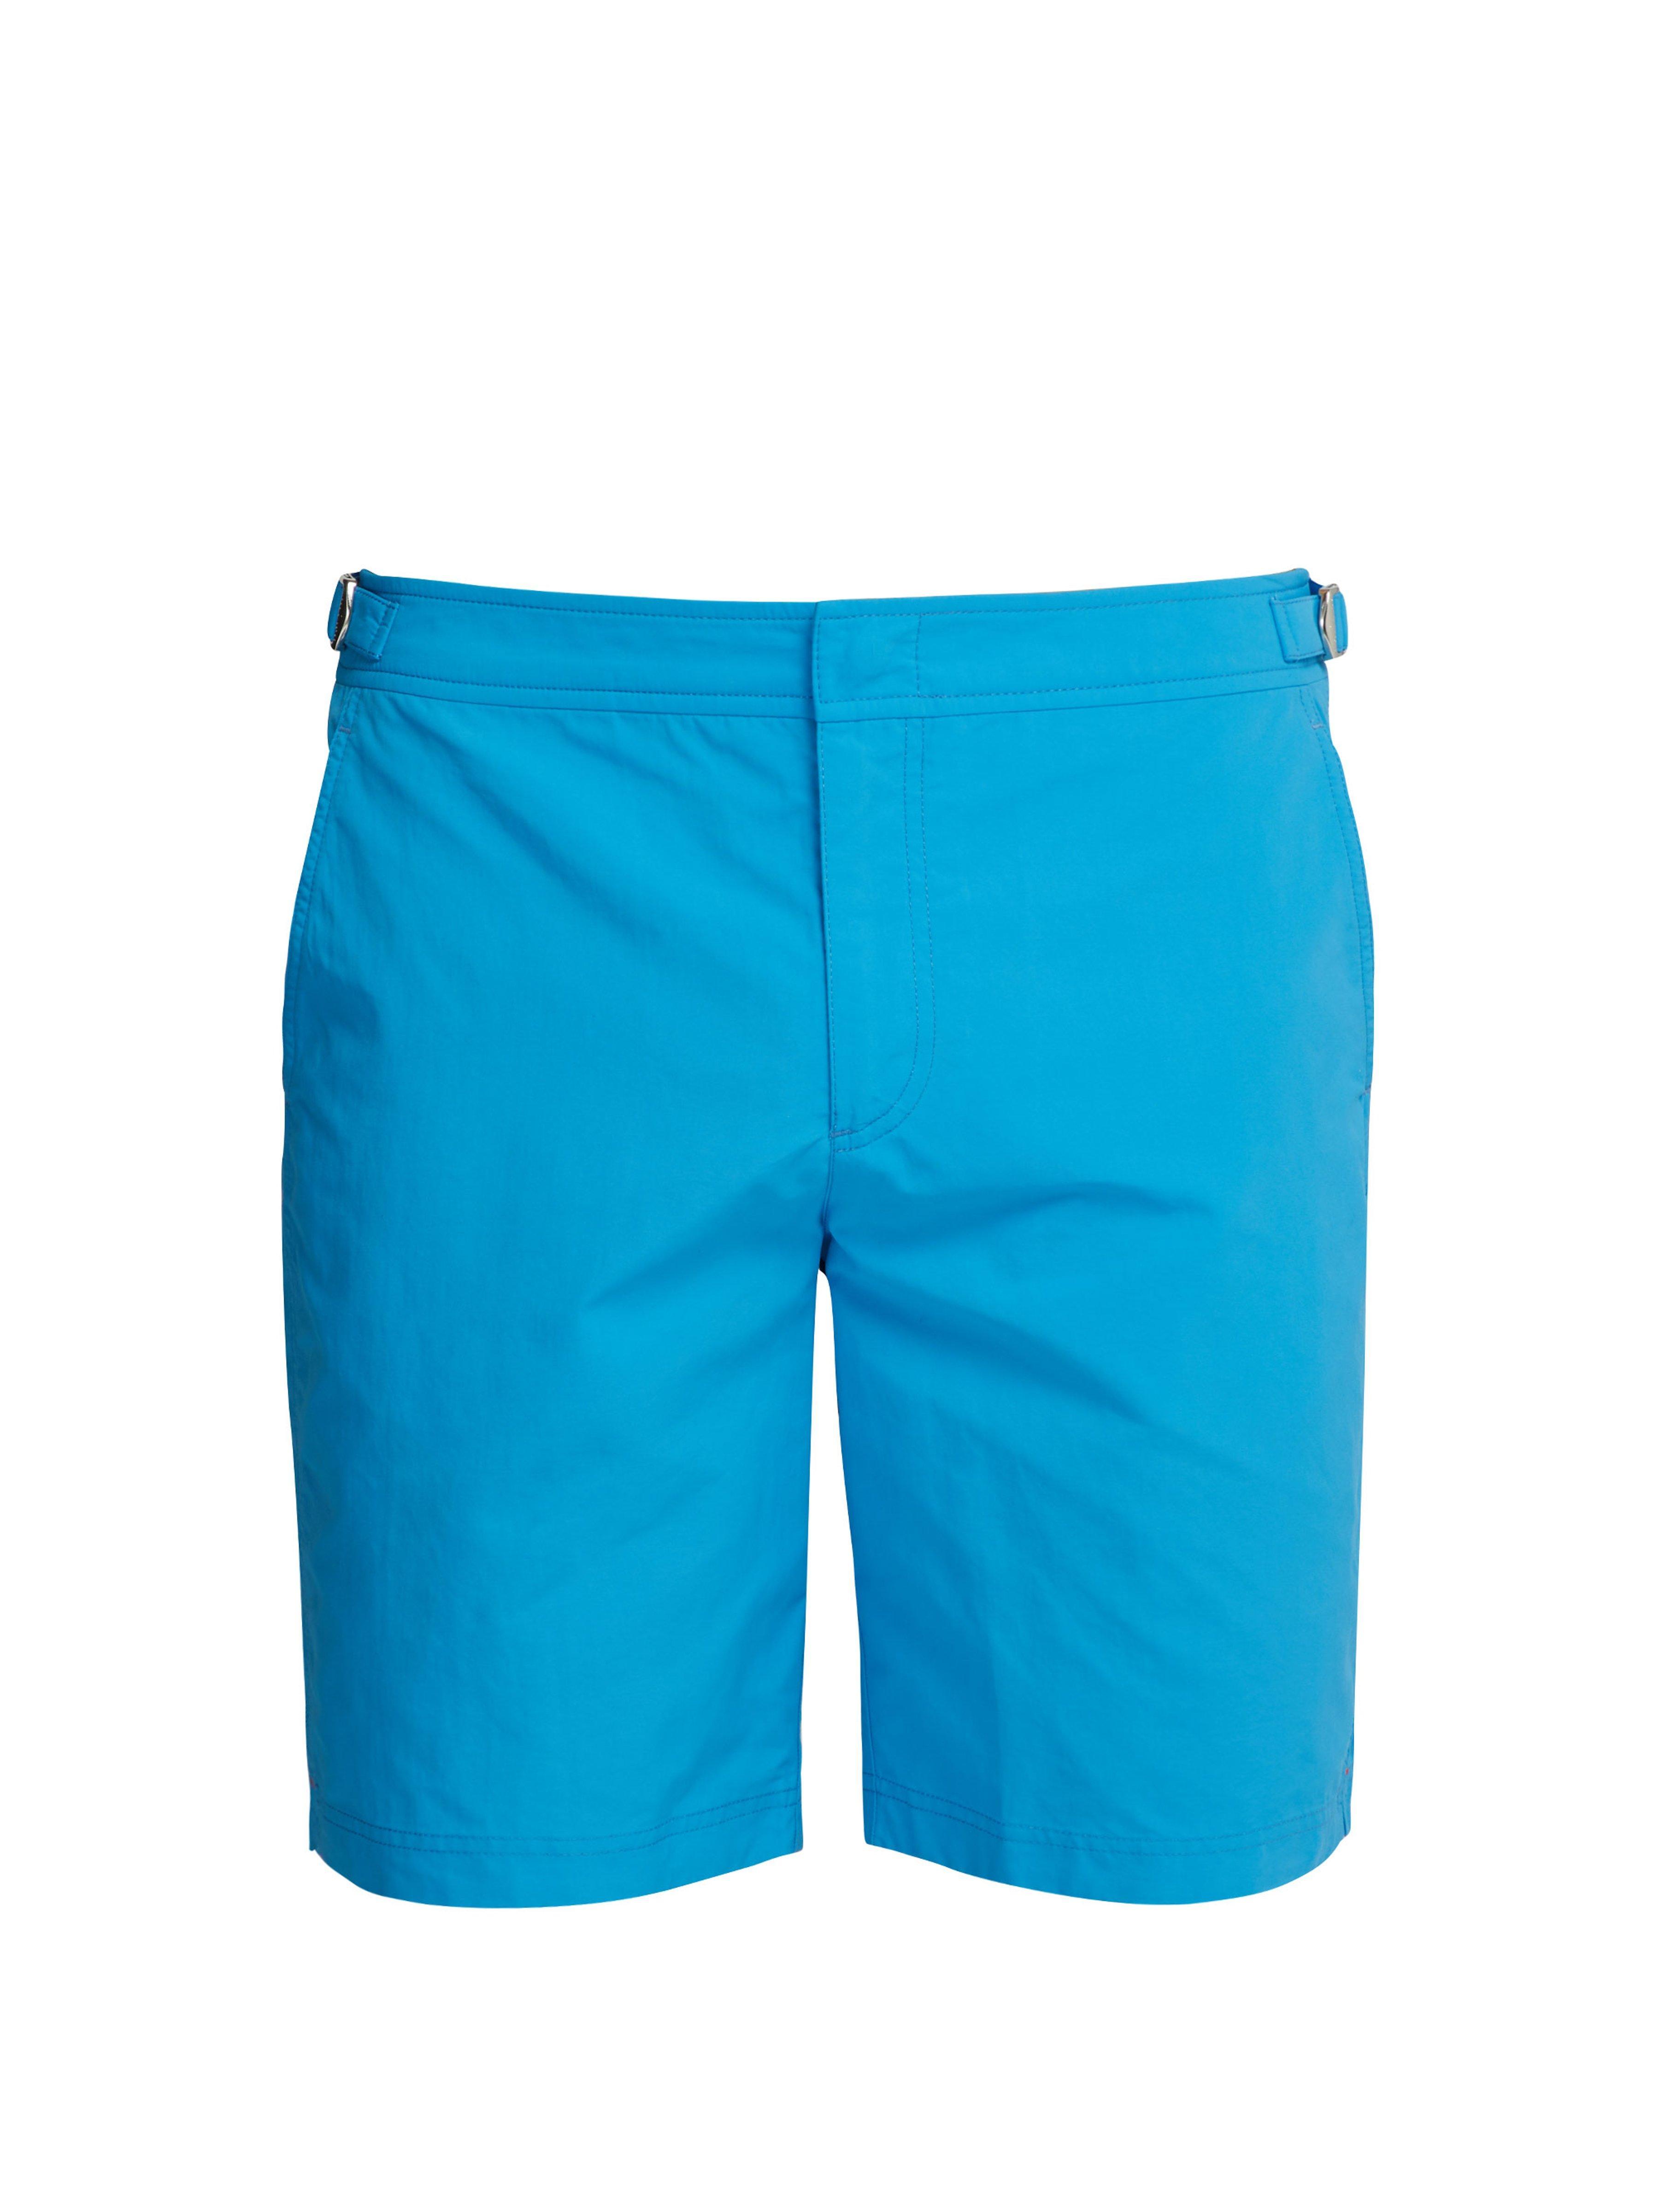 59f10bb7c0 Orlebar Brown Dane Ii Swim Shorts in Blue for Men - Lyst